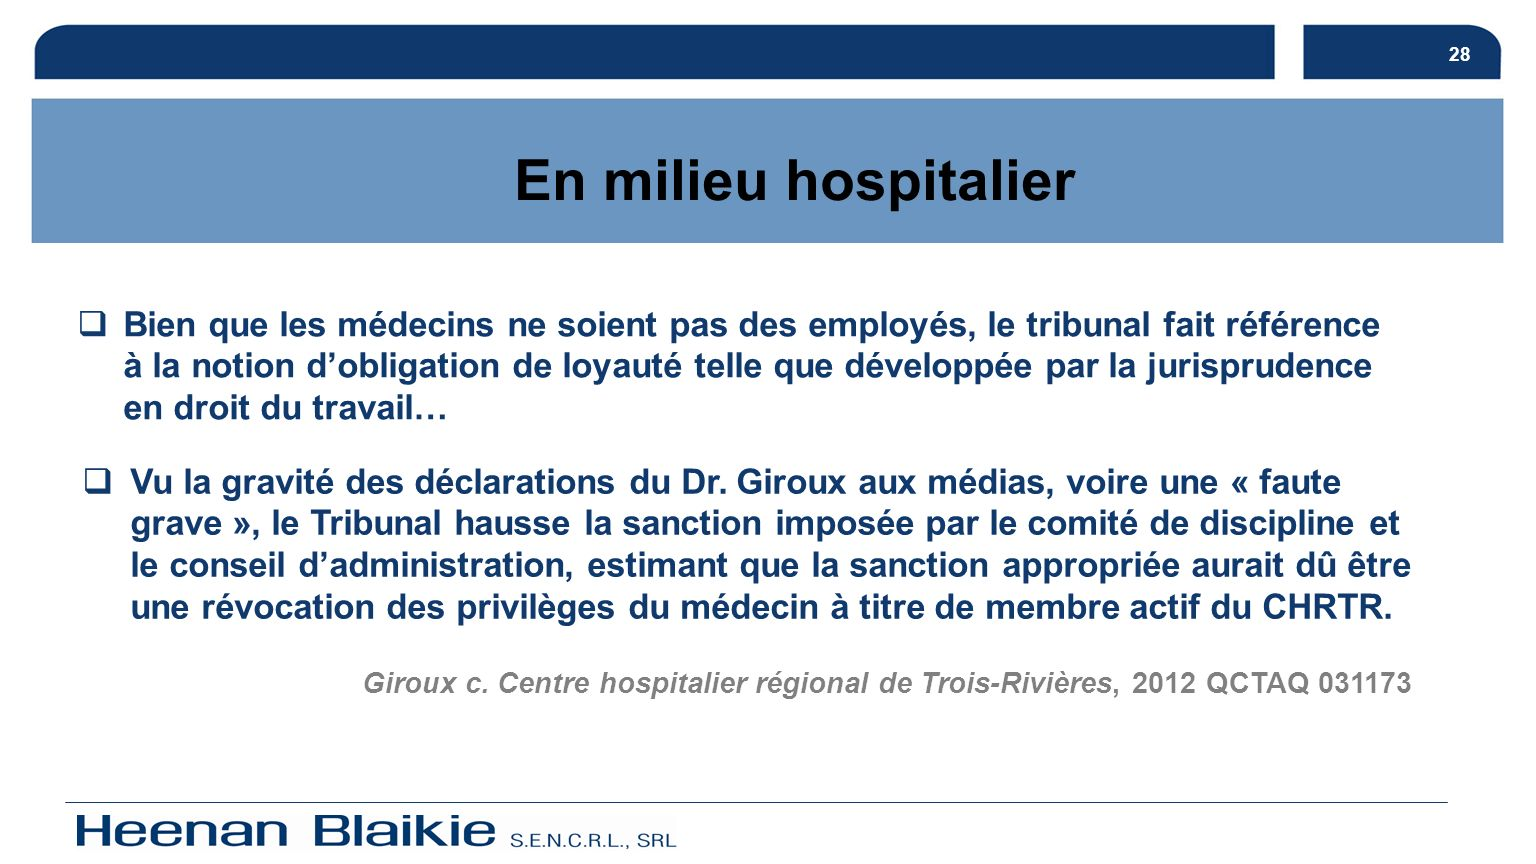 28En milieu hospitalier.